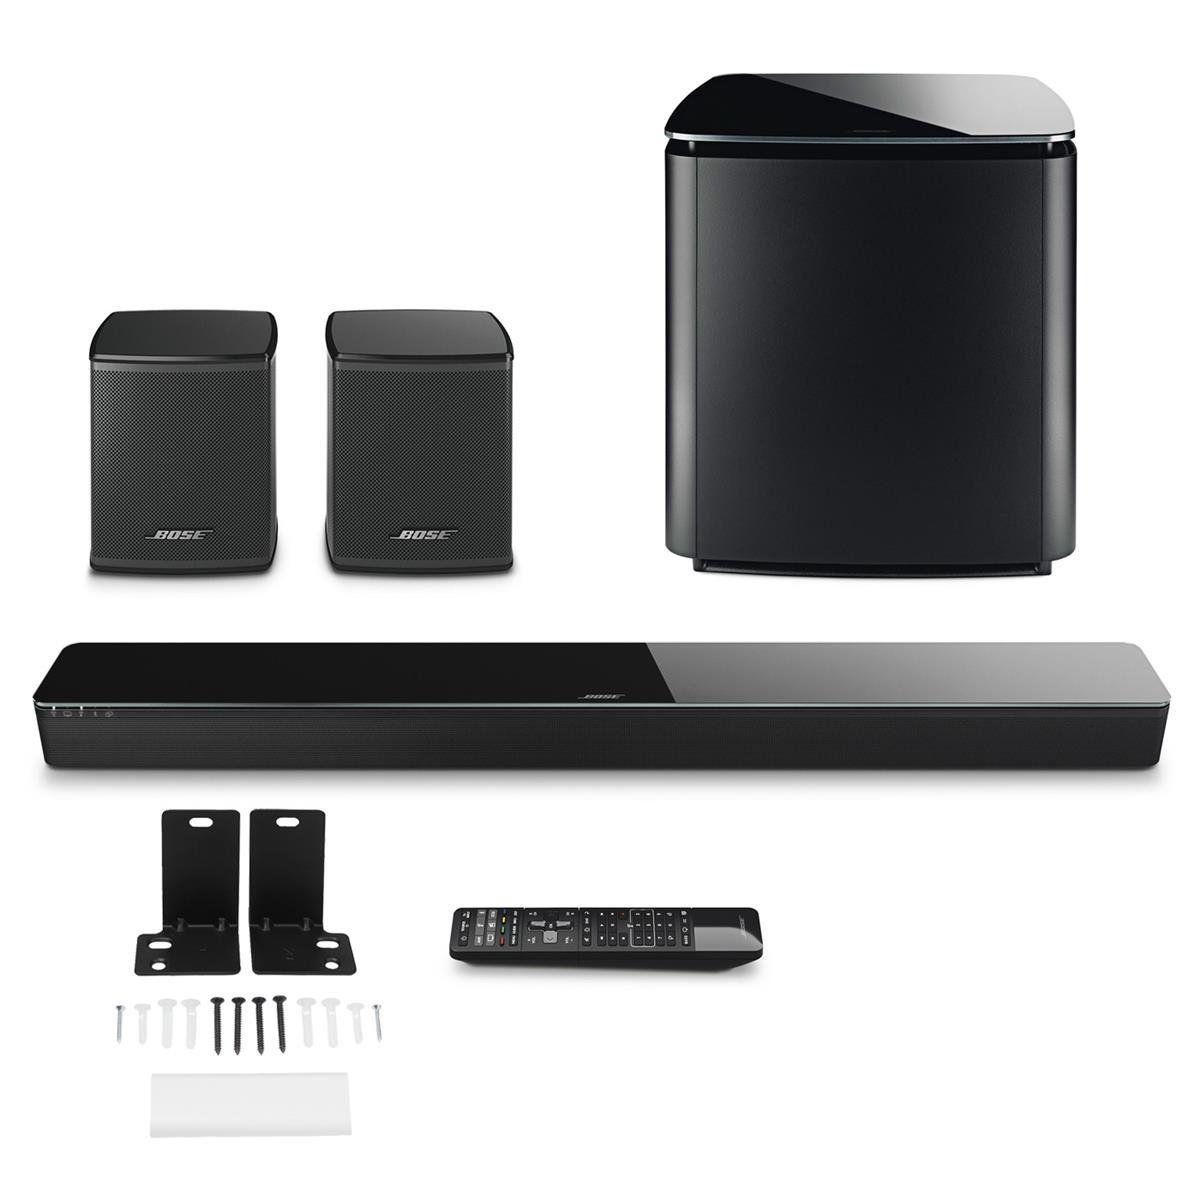 Bose Soundtouch 300 Soundbar W Wb300 Wall Bracket Wireless Acoustimass 300 Bass Module Wireless Sur Sound Bar Wireless Surround Speakers Surround Speakers